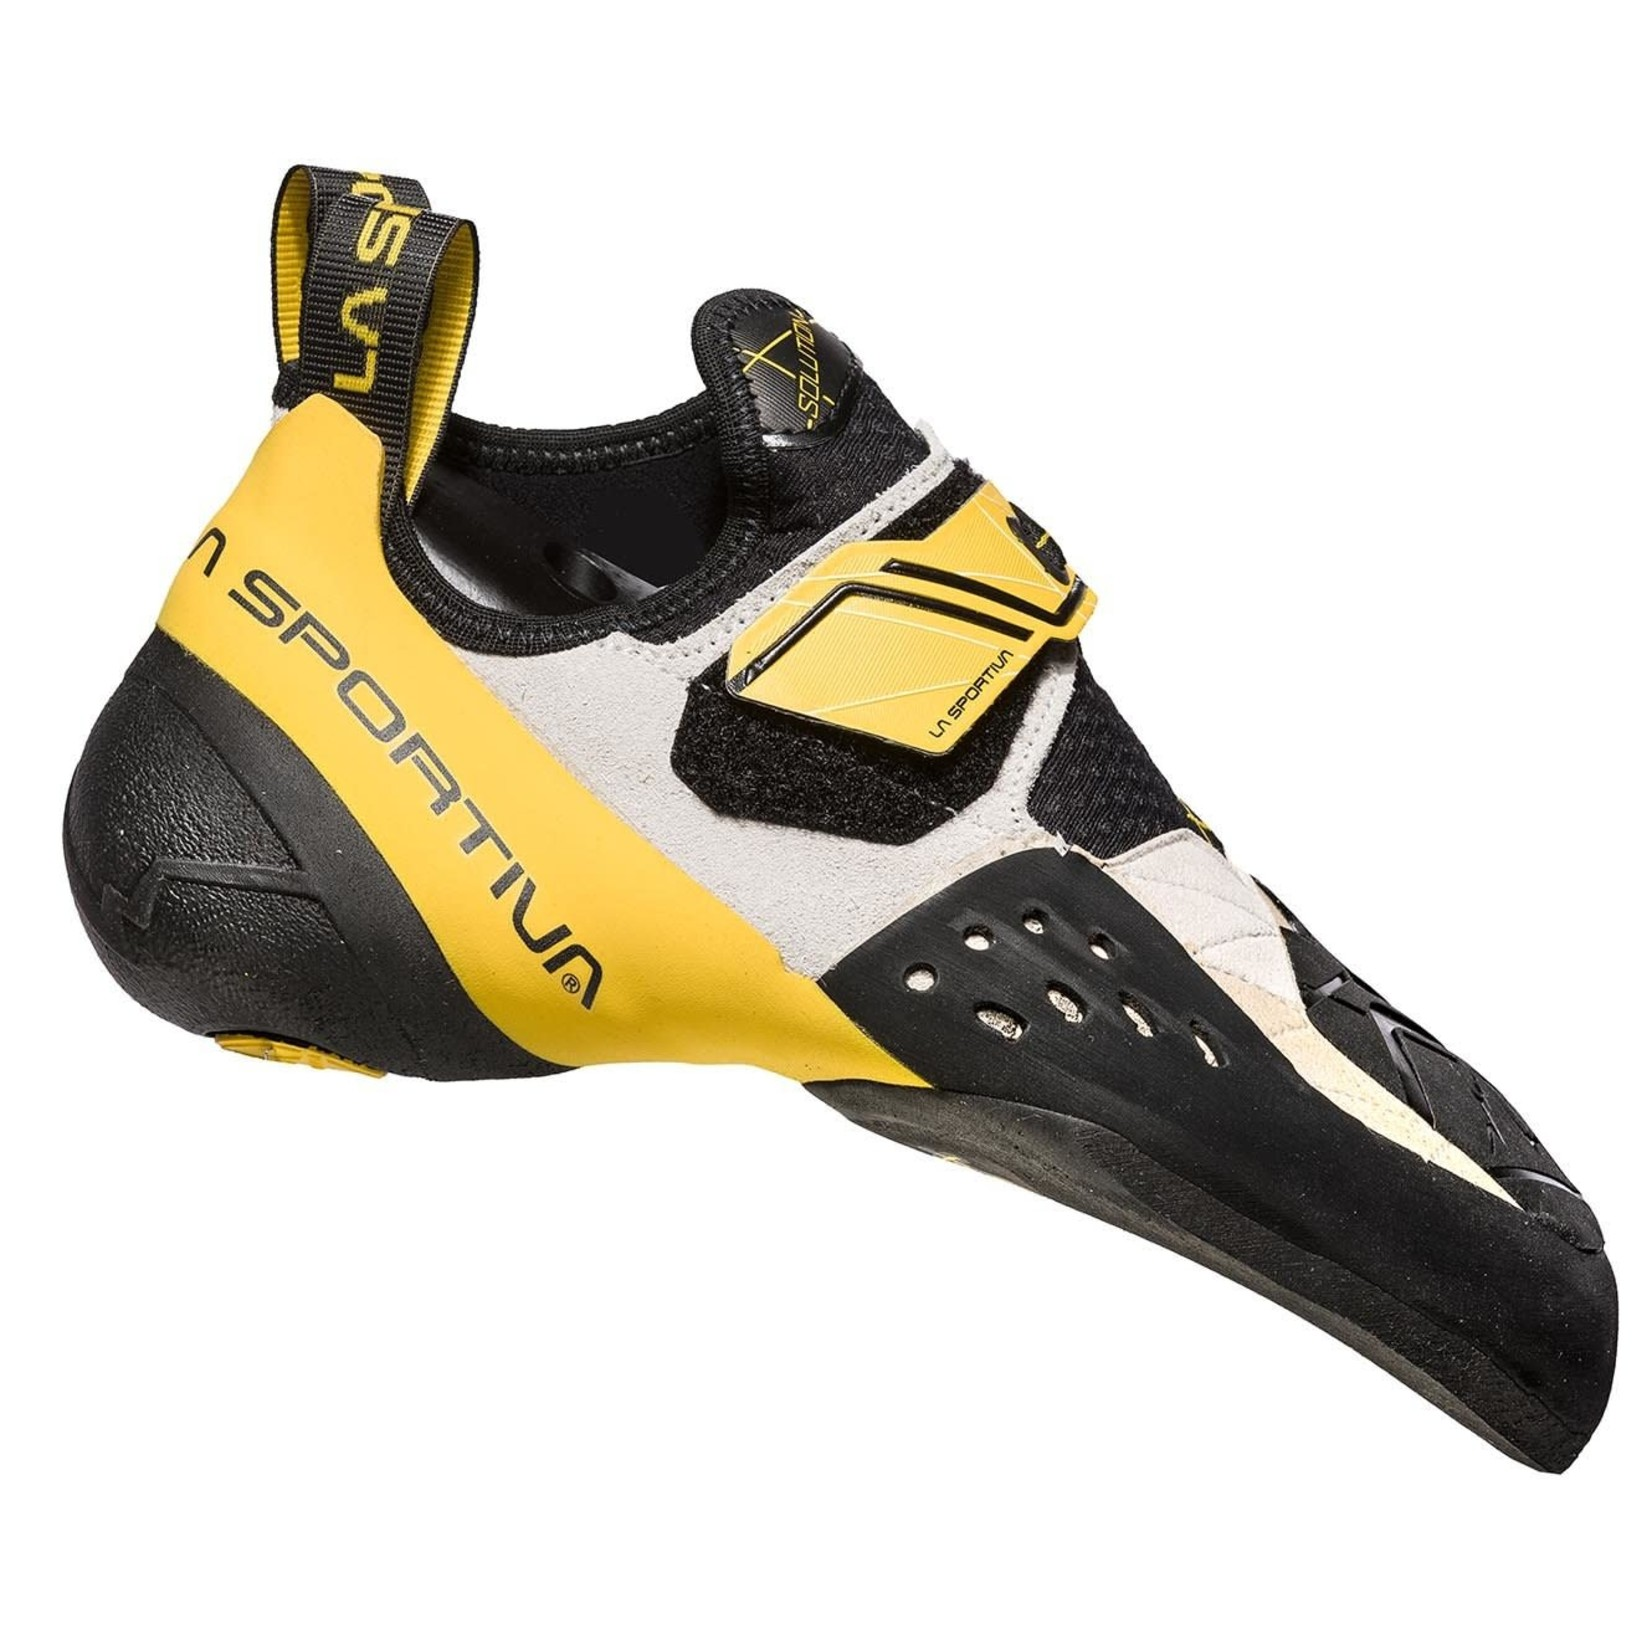 La Sportiva La Sportiva Solution Climbing Shoes - Men